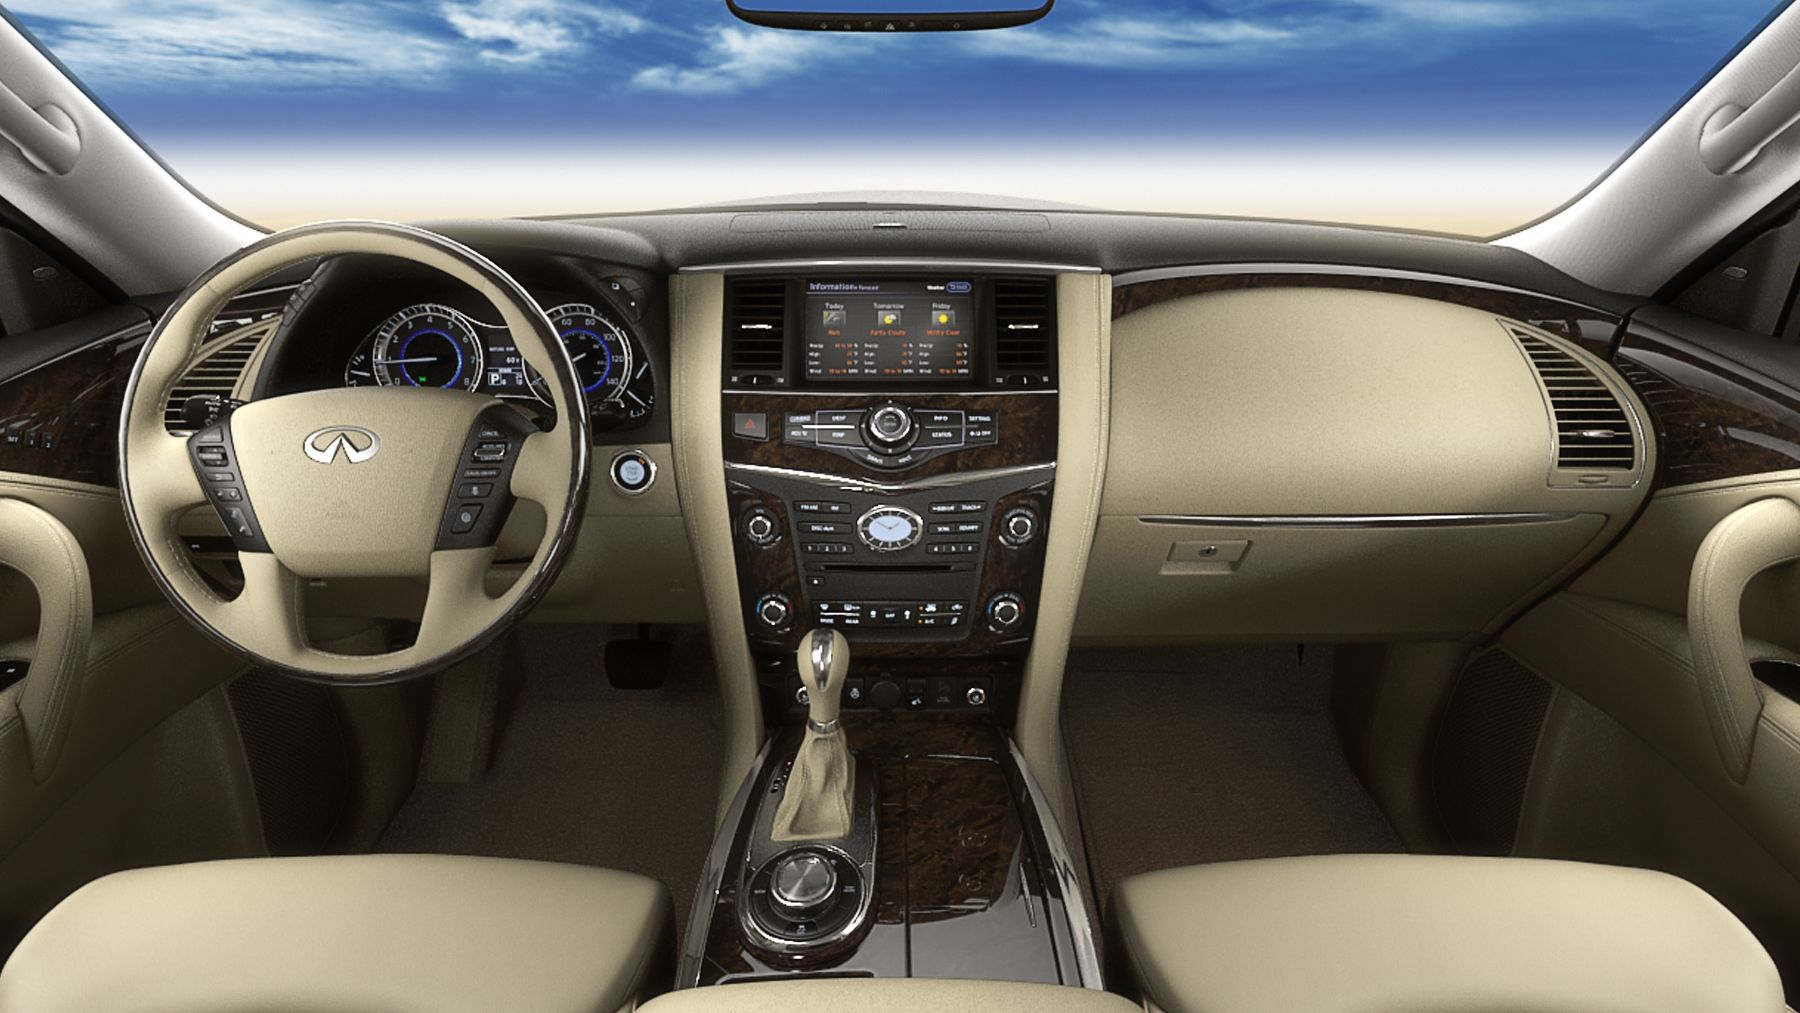 Infiniti Suv Car Beige Dashboard Interior